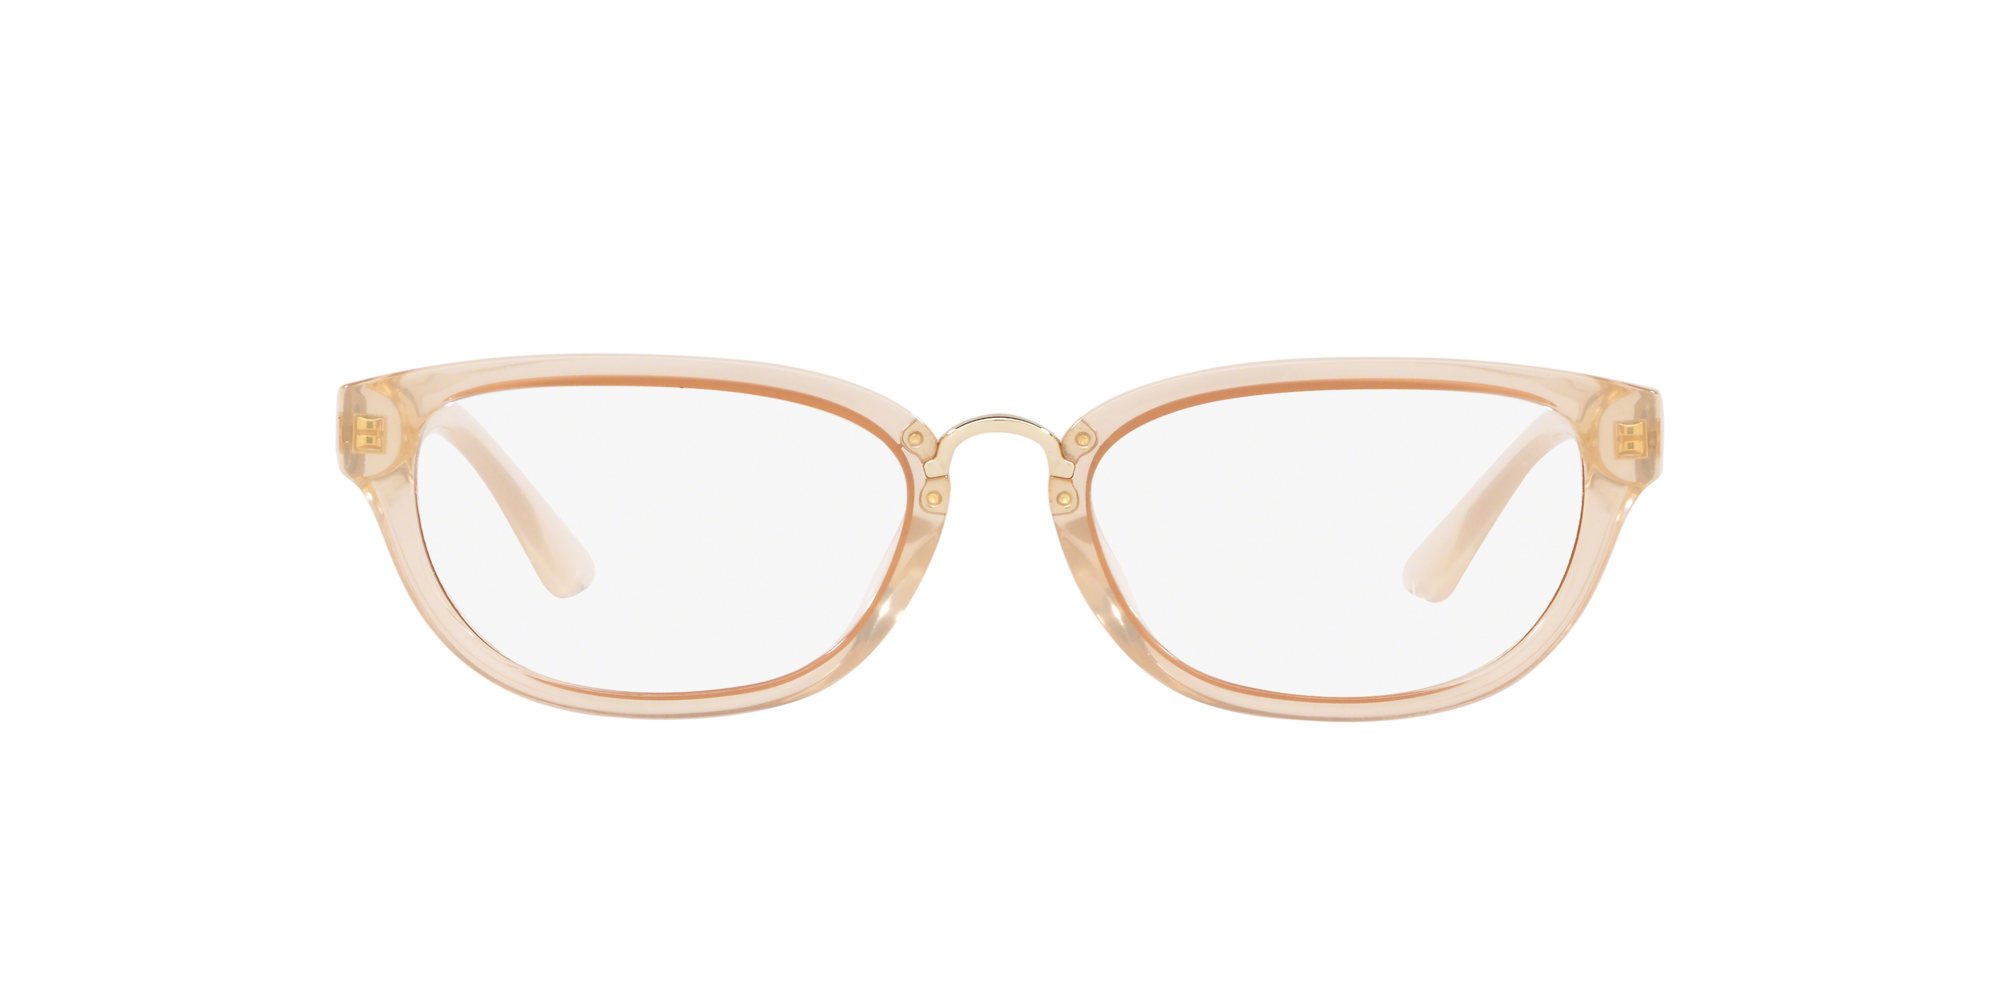 Image for TY4005U from LensCrafters | Glasses, Prescription Glasses Online, Eyewear